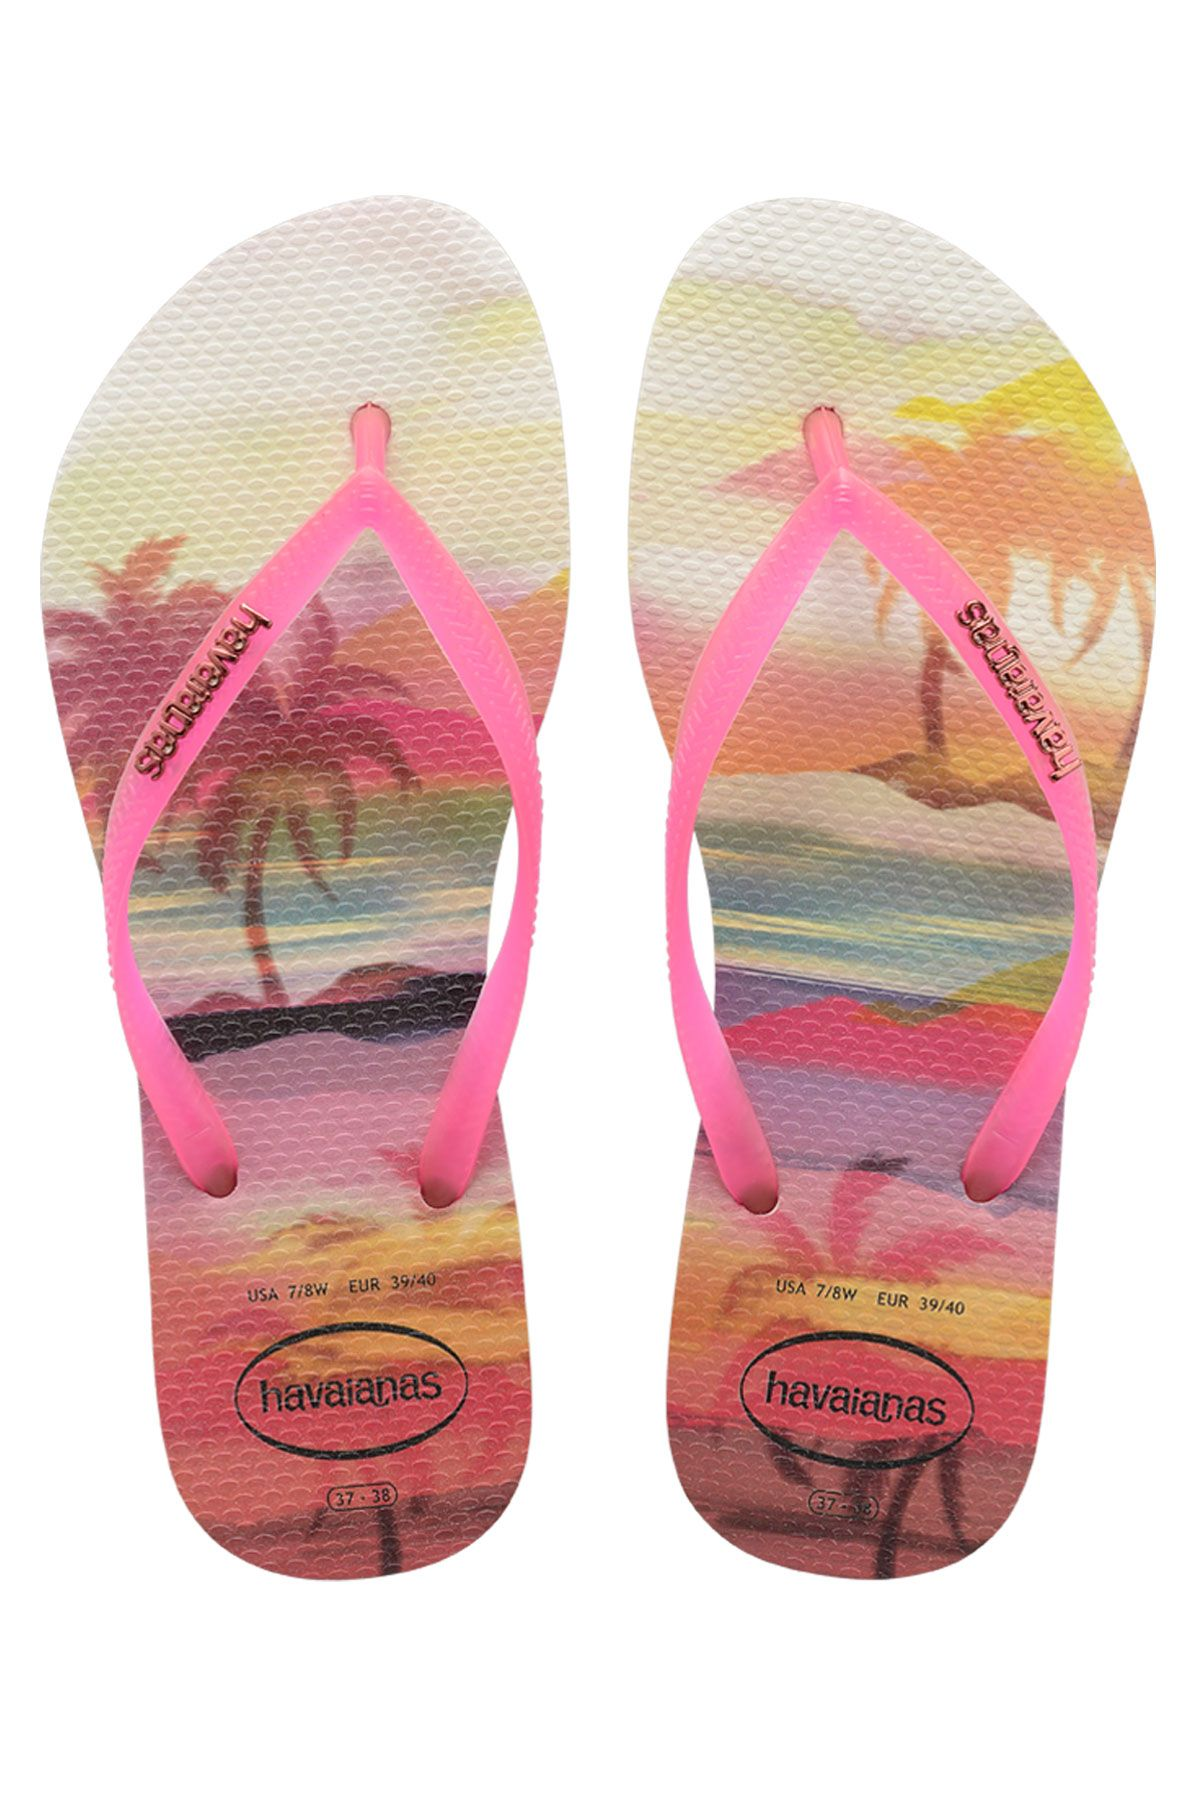 5b0f0062a Havaianas's Sandals   Everything But Water #tropical #swim #resort #swim  #travel #getaway